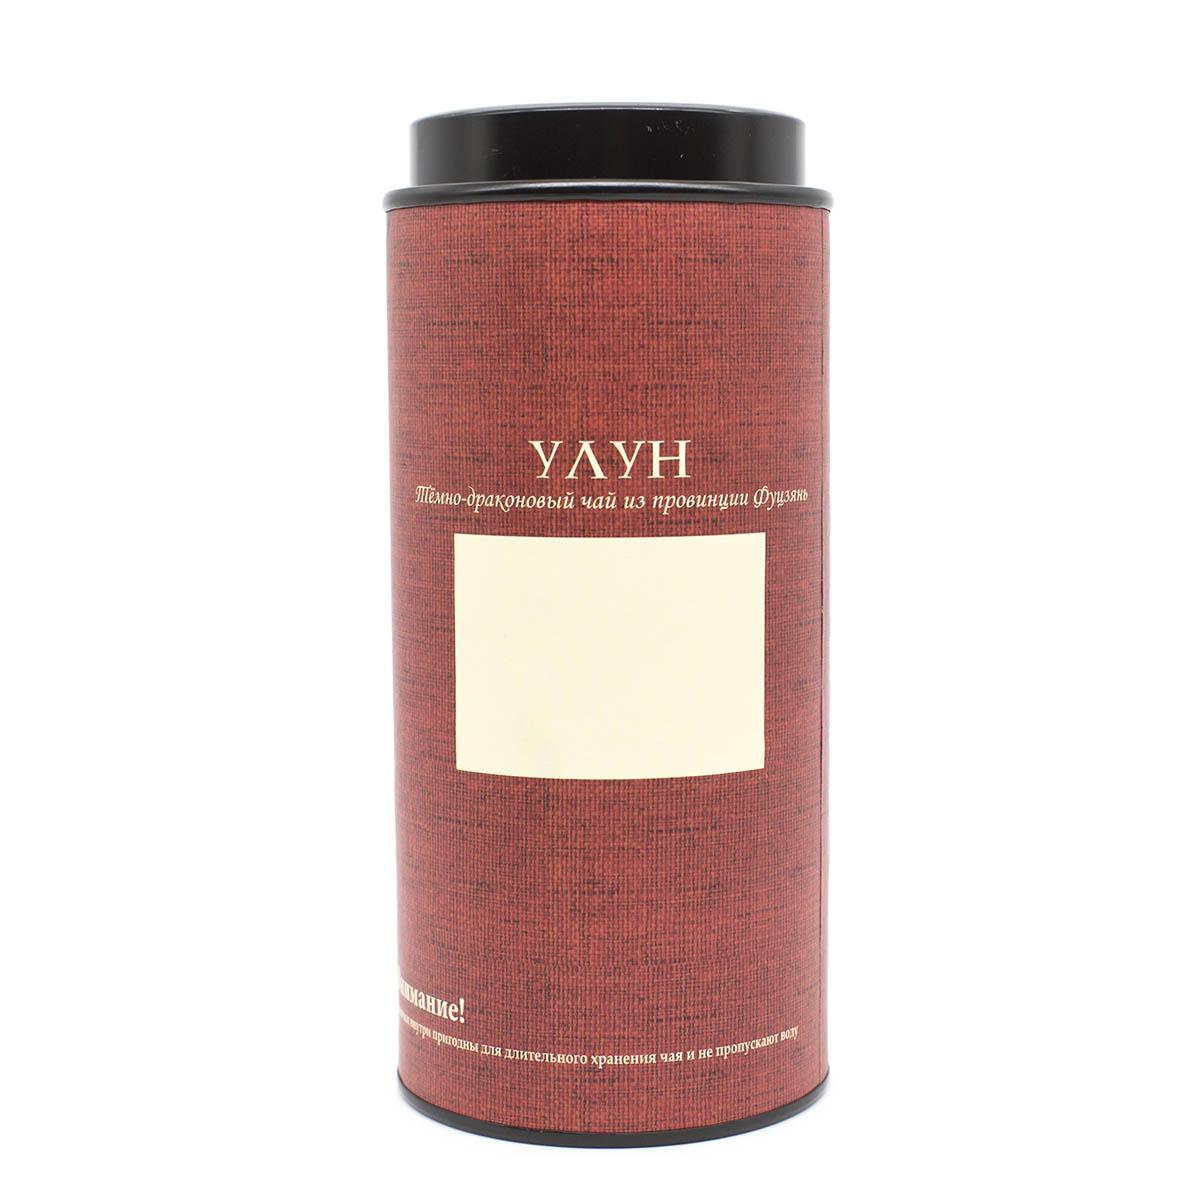 Банка картонная Мелодия неба - Улун фуцзянский 76*145 банка картонная мелодия неба белый чай 76 175